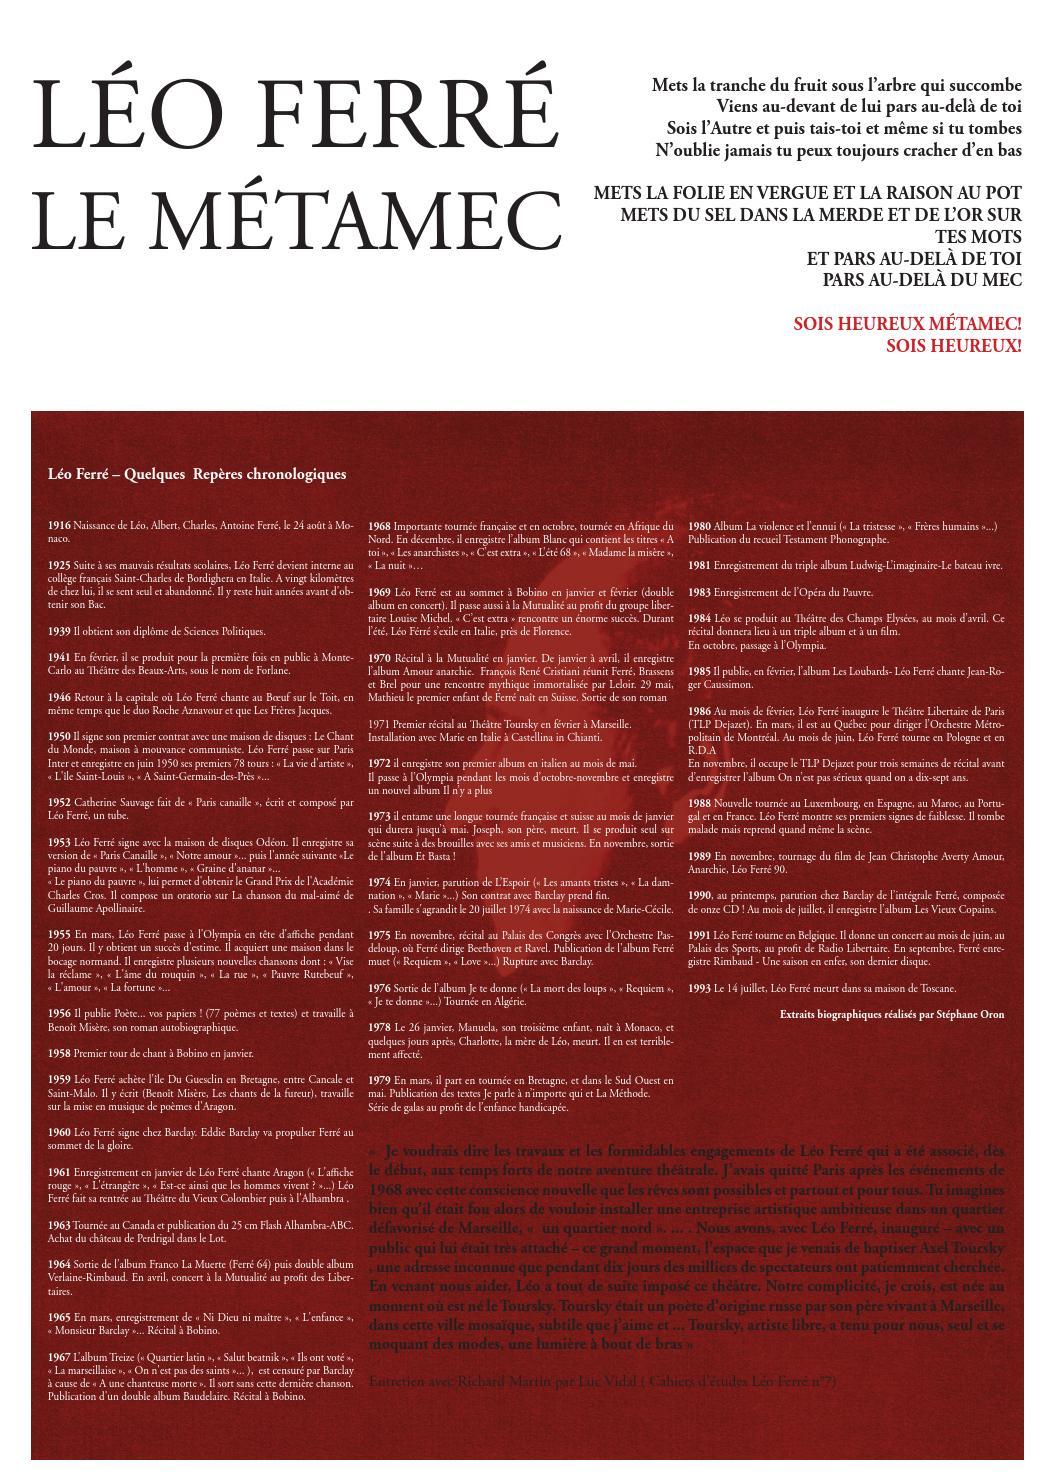 Métamec2 By Vidal Luc Issuu